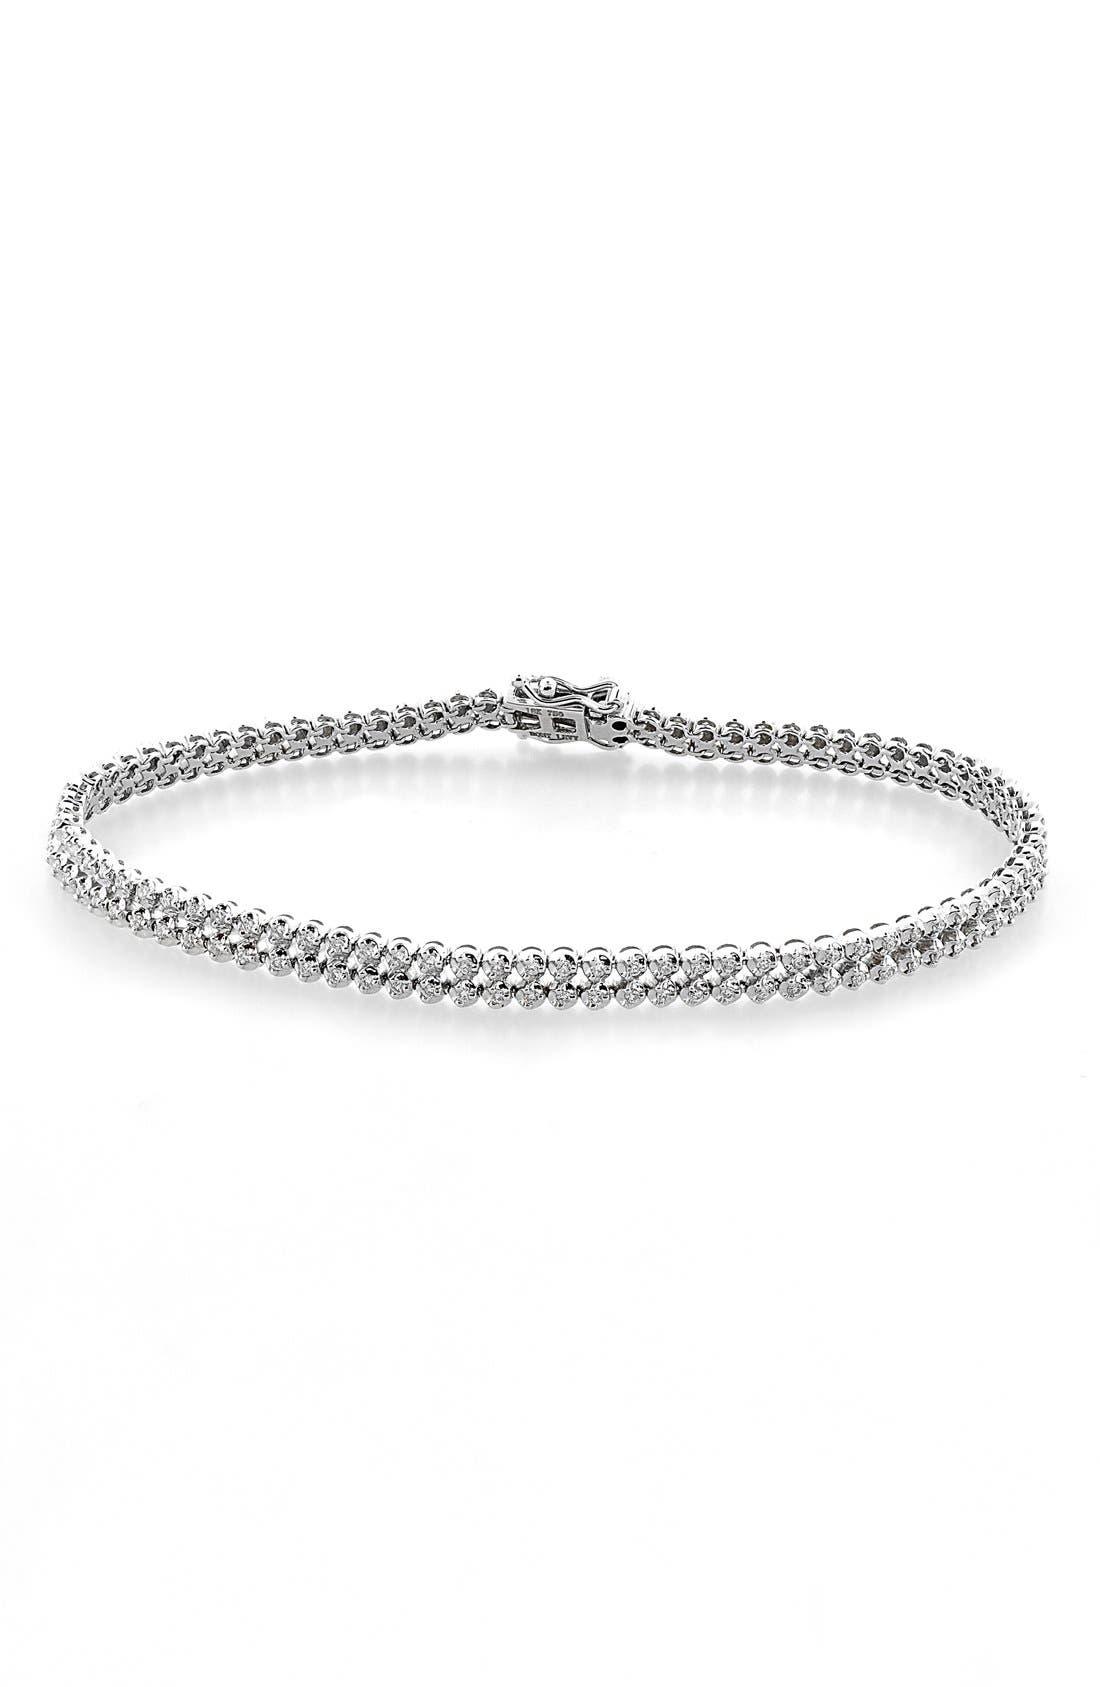 Diamond Line Bracelet,                         Main,                         color, WHITE GOLD